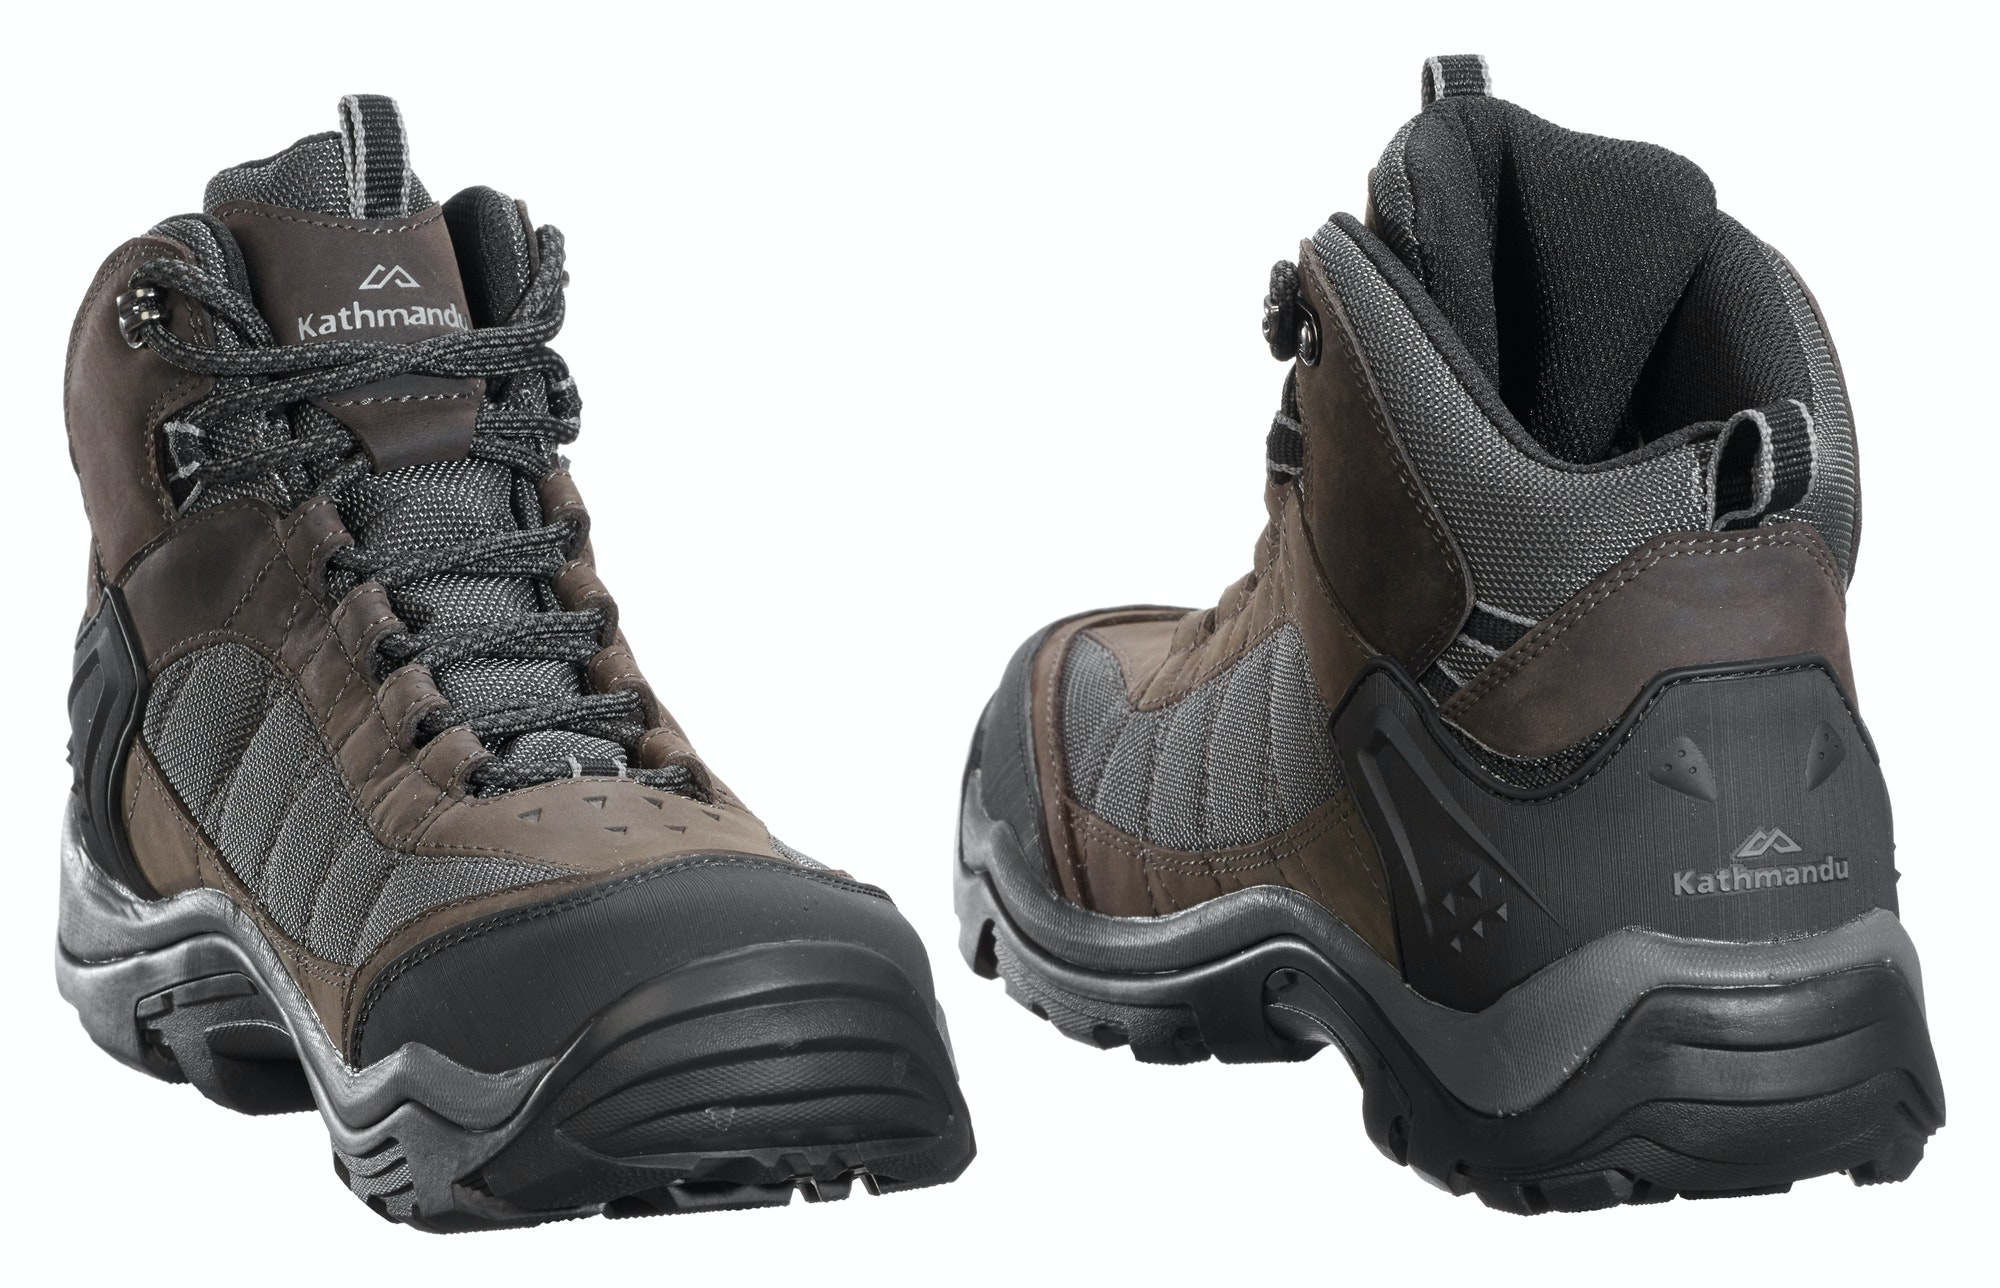 NEW-Kathmandu-Mornington-Mens-Vibram-Rubber-Waterproof-Lightweight-Hiking-Boots thumbnail 13